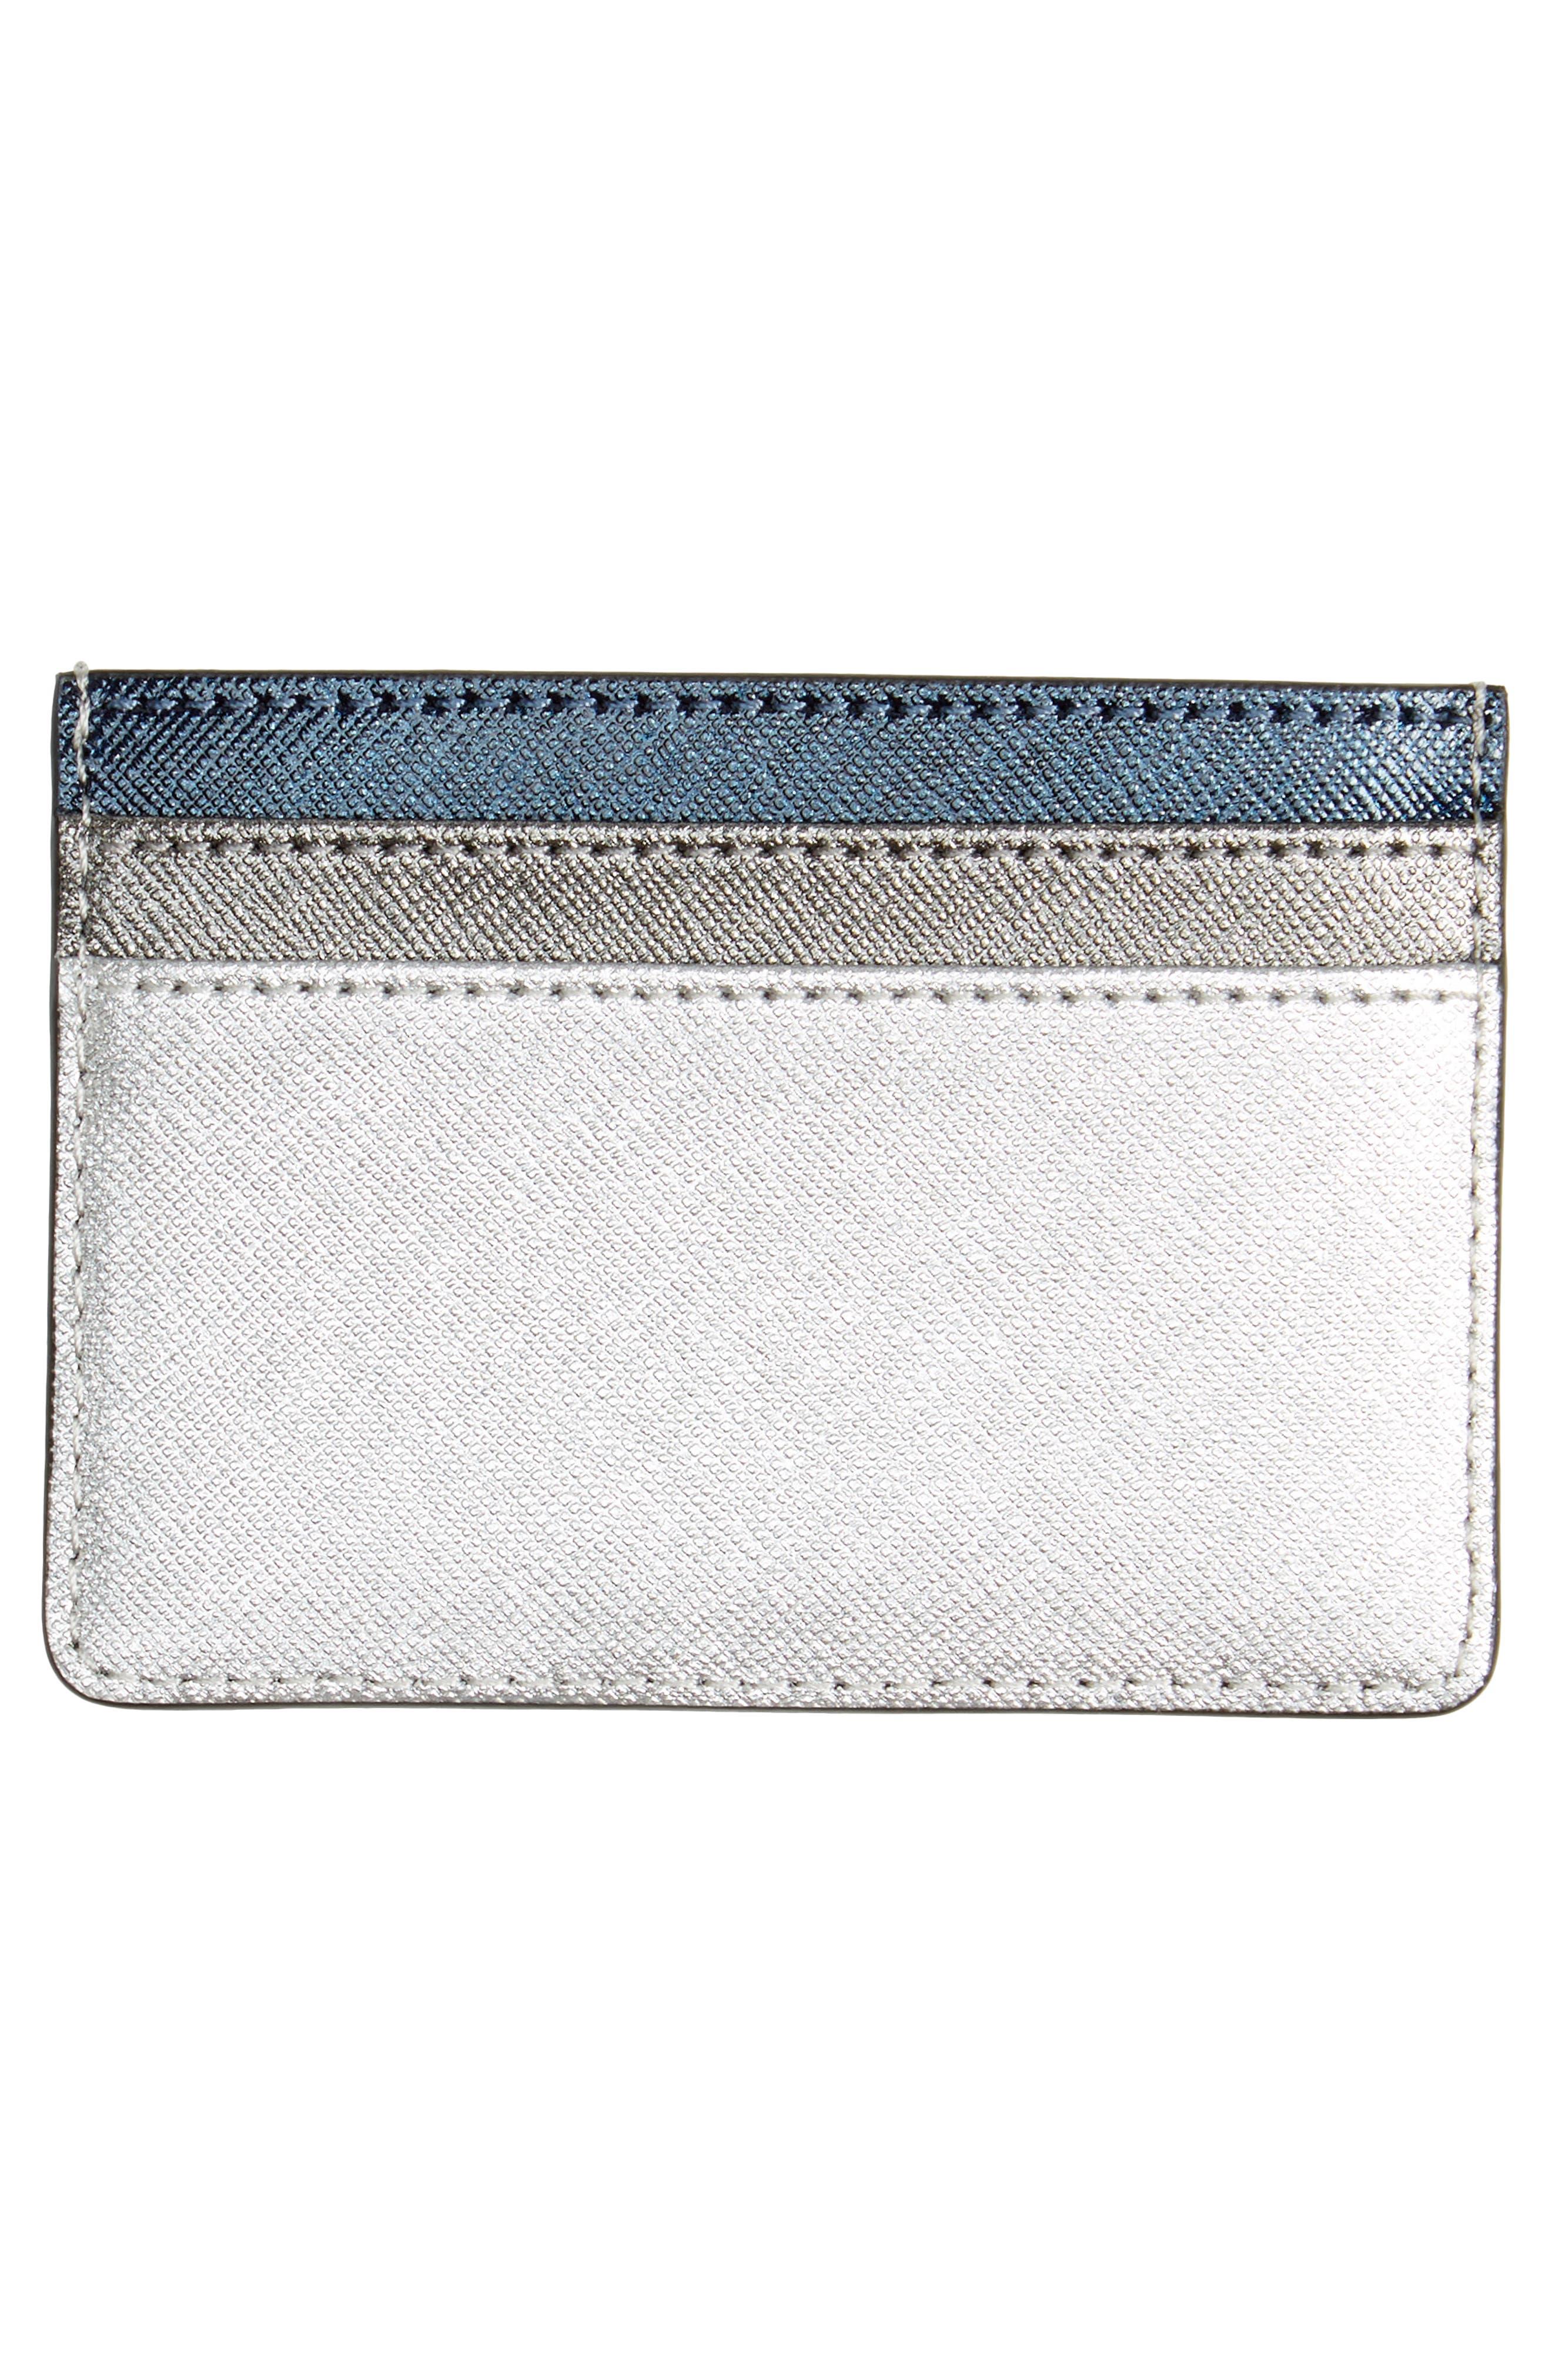 Snapshot Saffiano Leather Card Case,                             Alternate thumbnail 2, color,                             040